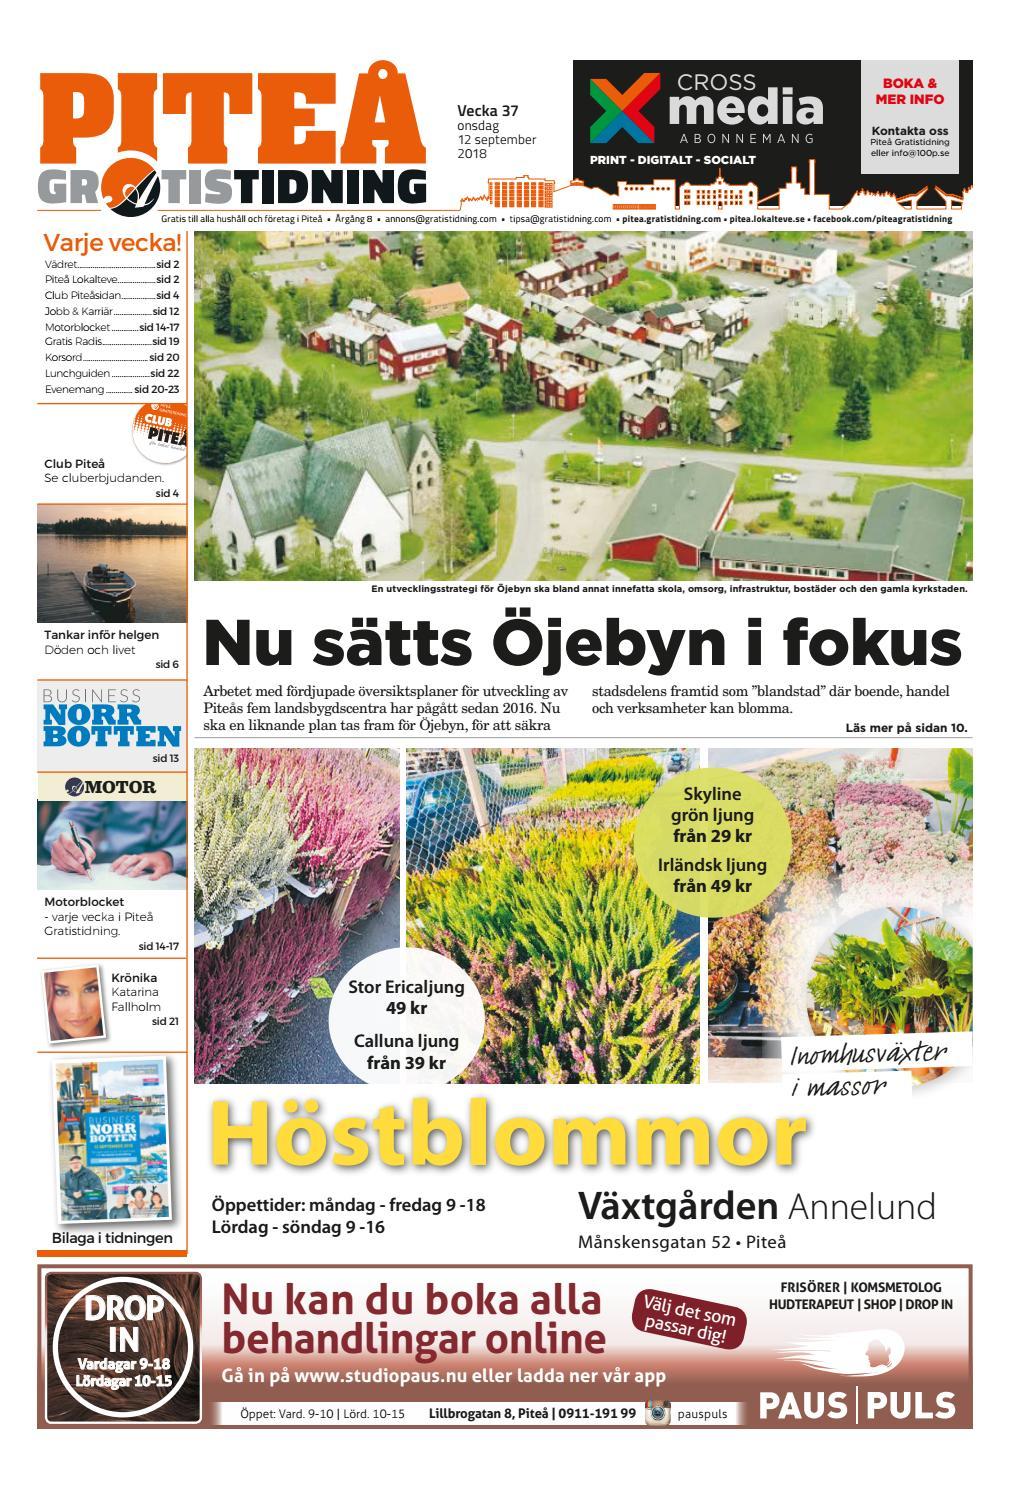 Skyddsombud fick trffa Littorin - Dagens Arbete